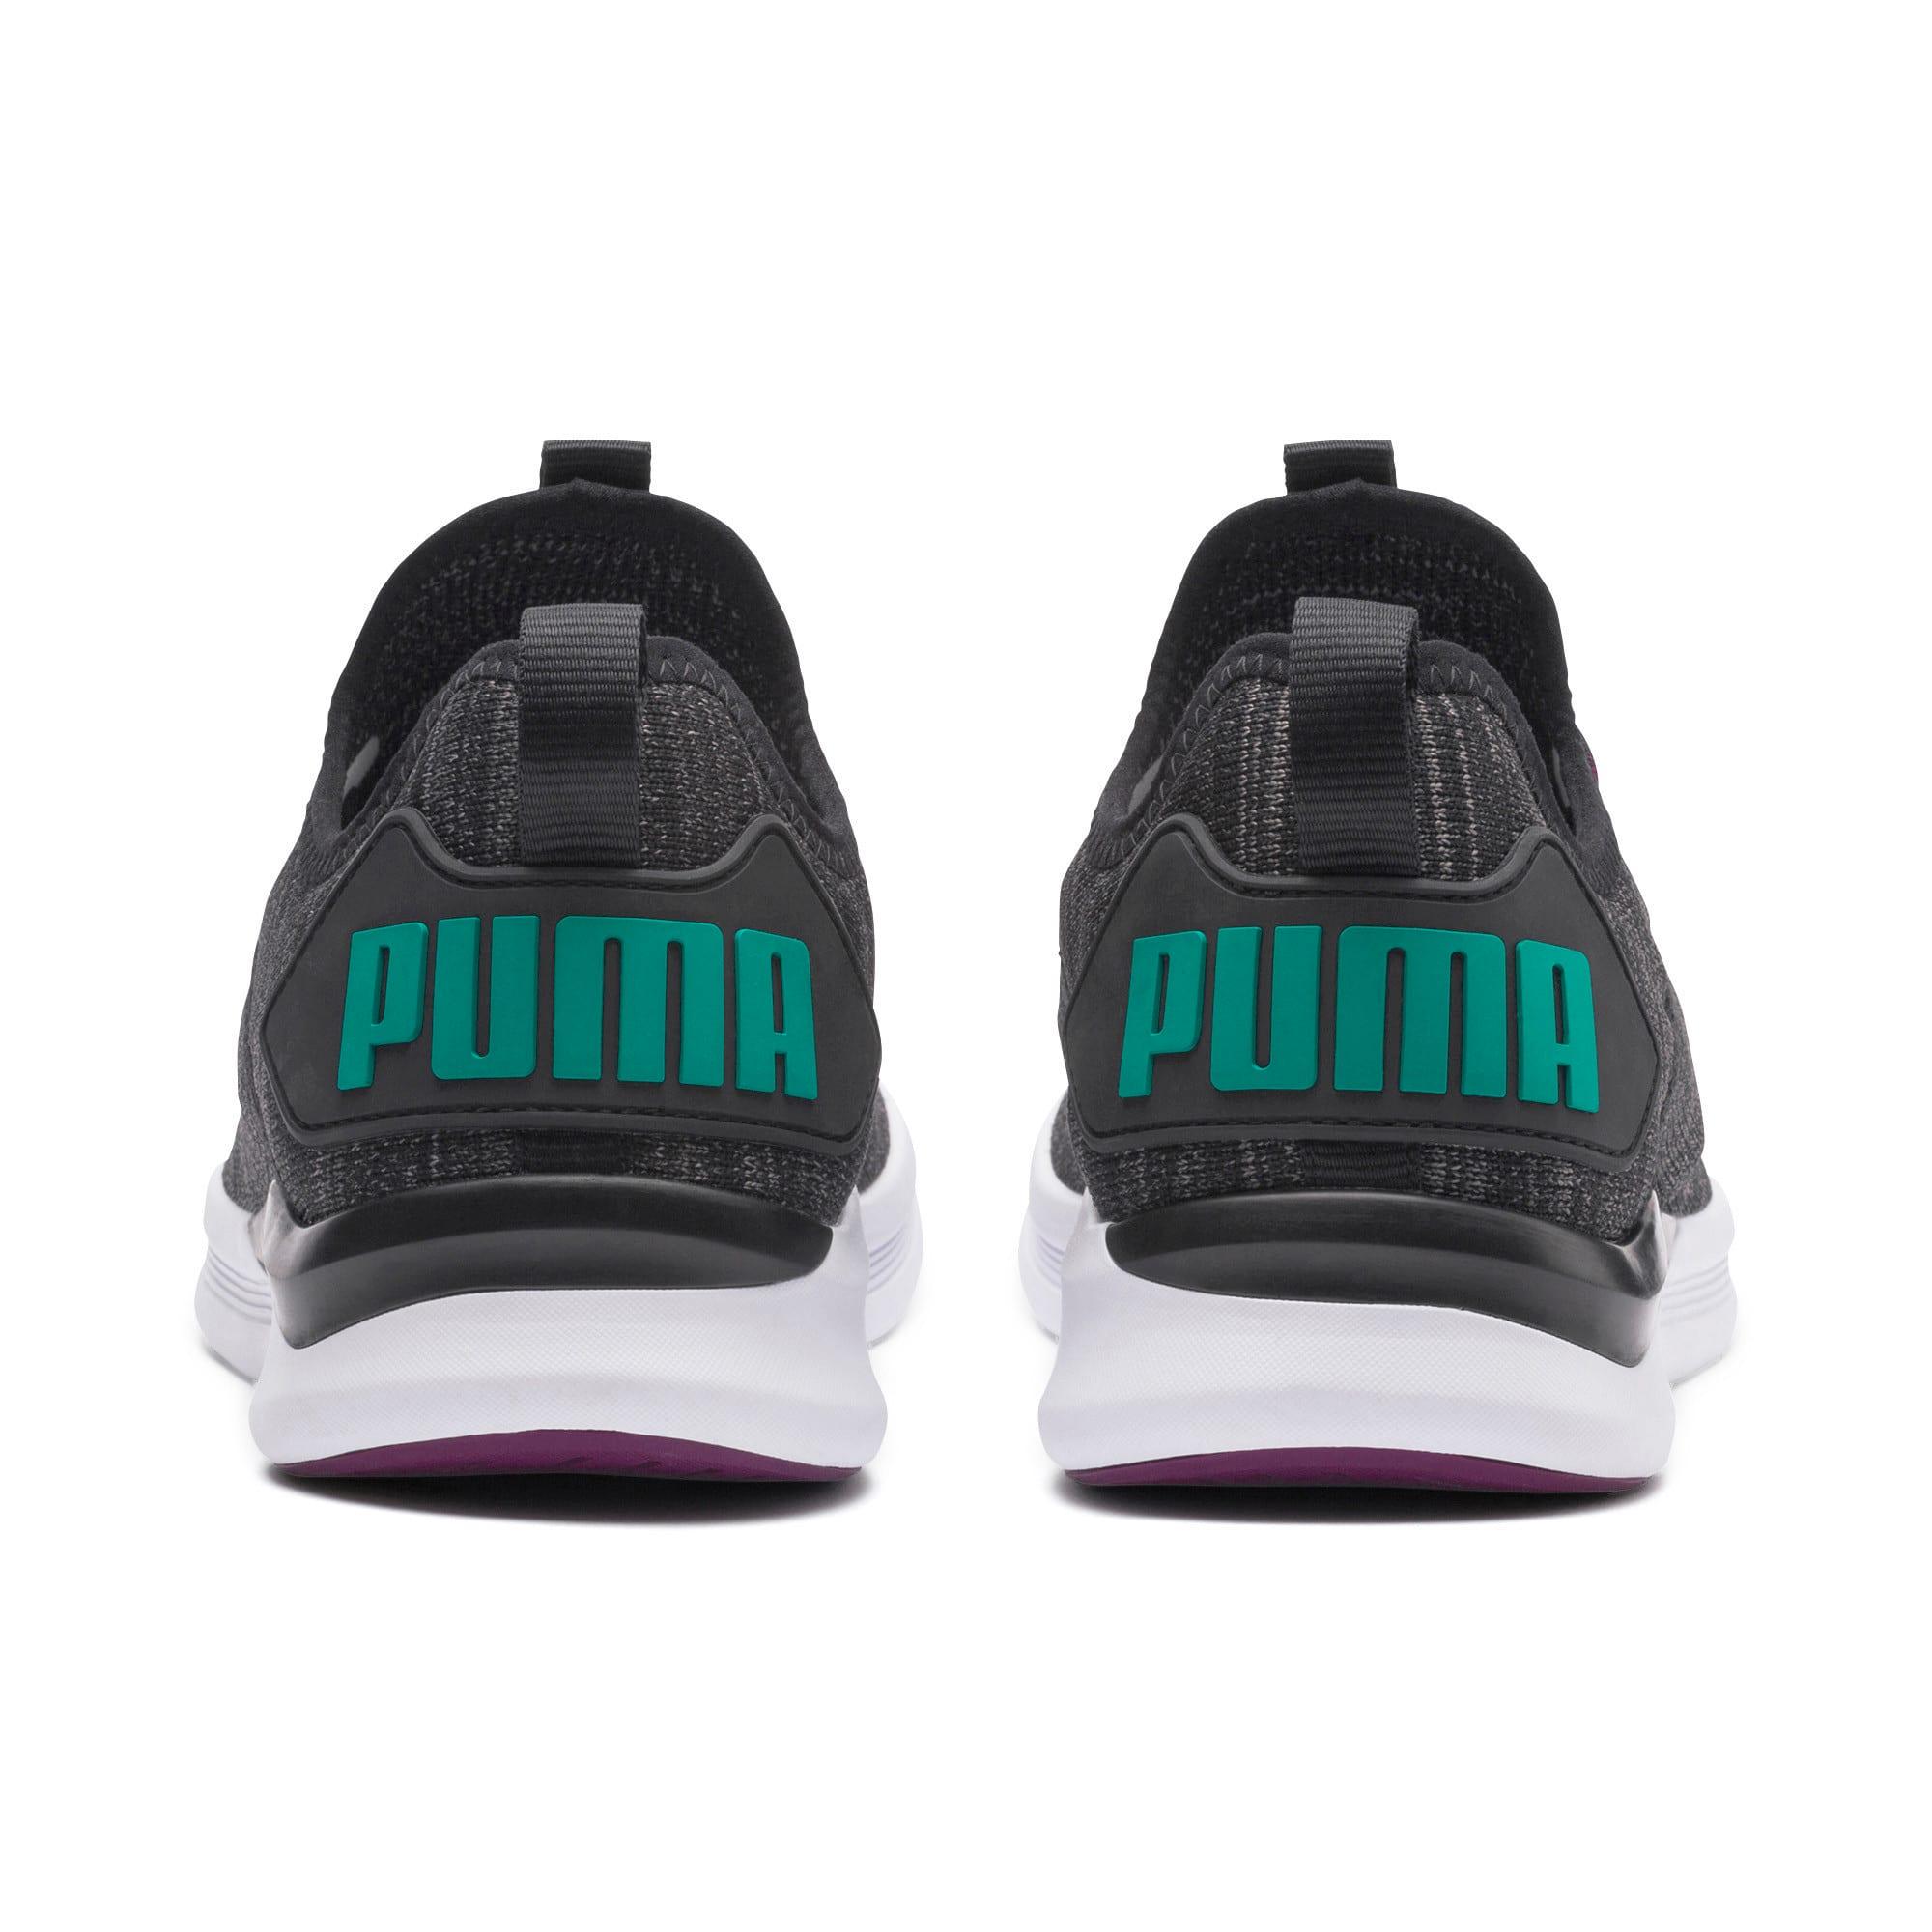 Thumbnail 4 of IGNITE Flash evoKNIT Men's Training Shoes, Black-Dk Shadow-Spectra Grn, medium-IND